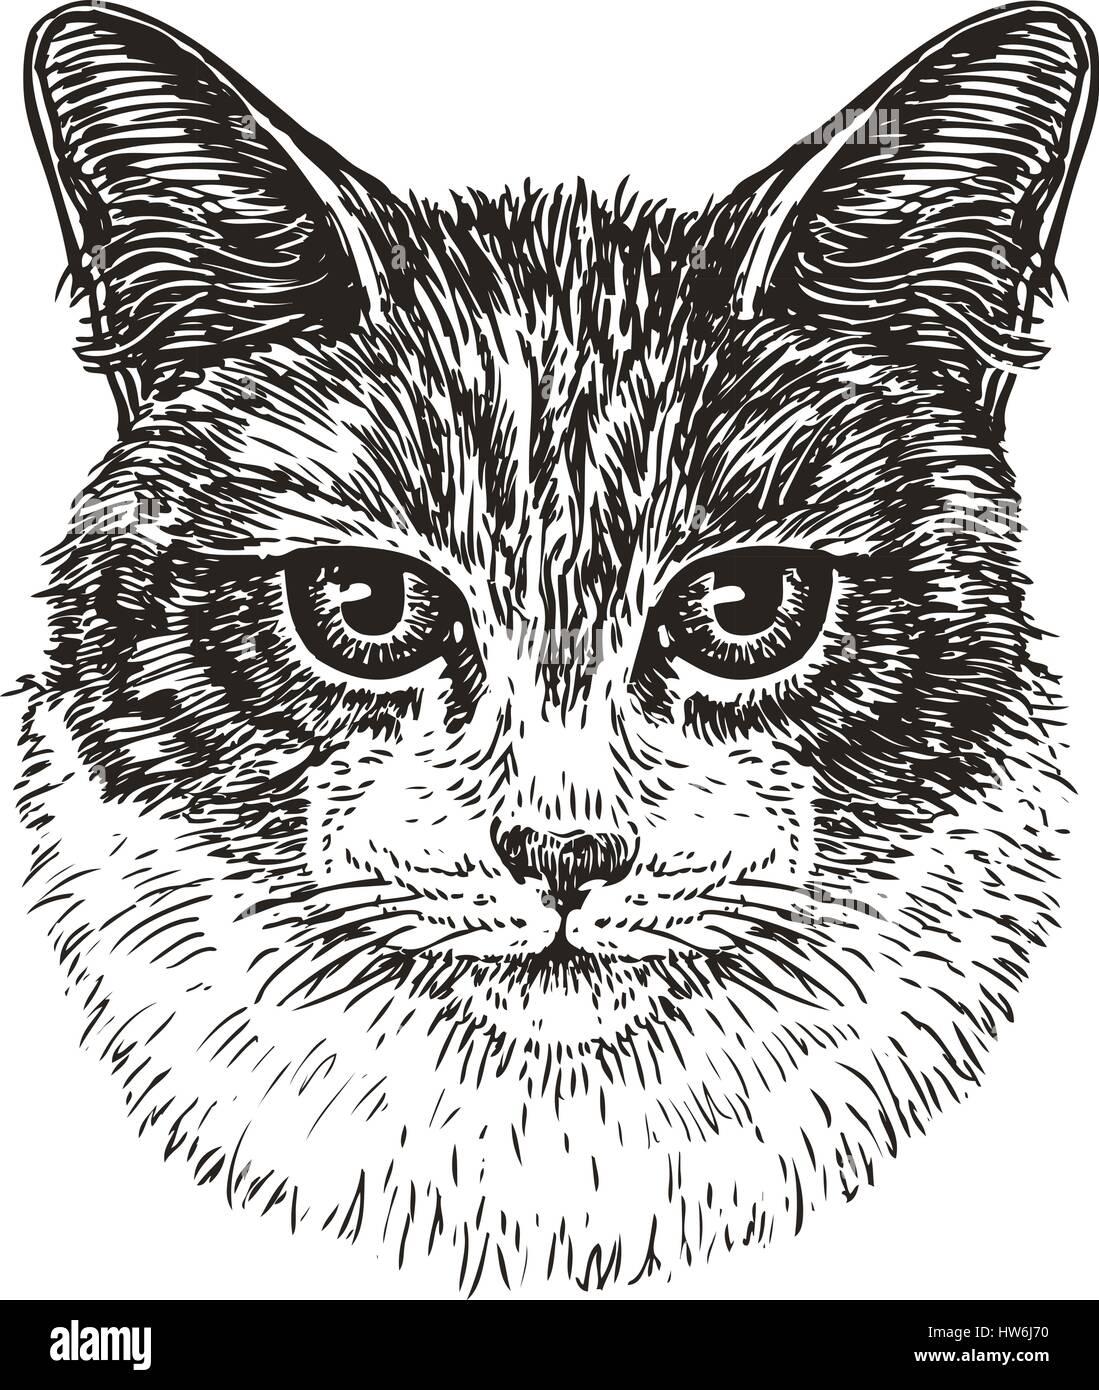 Drawn Portrait Of Cute Cat Animal Kitty Pet Sketch Vintage Vector Illustration